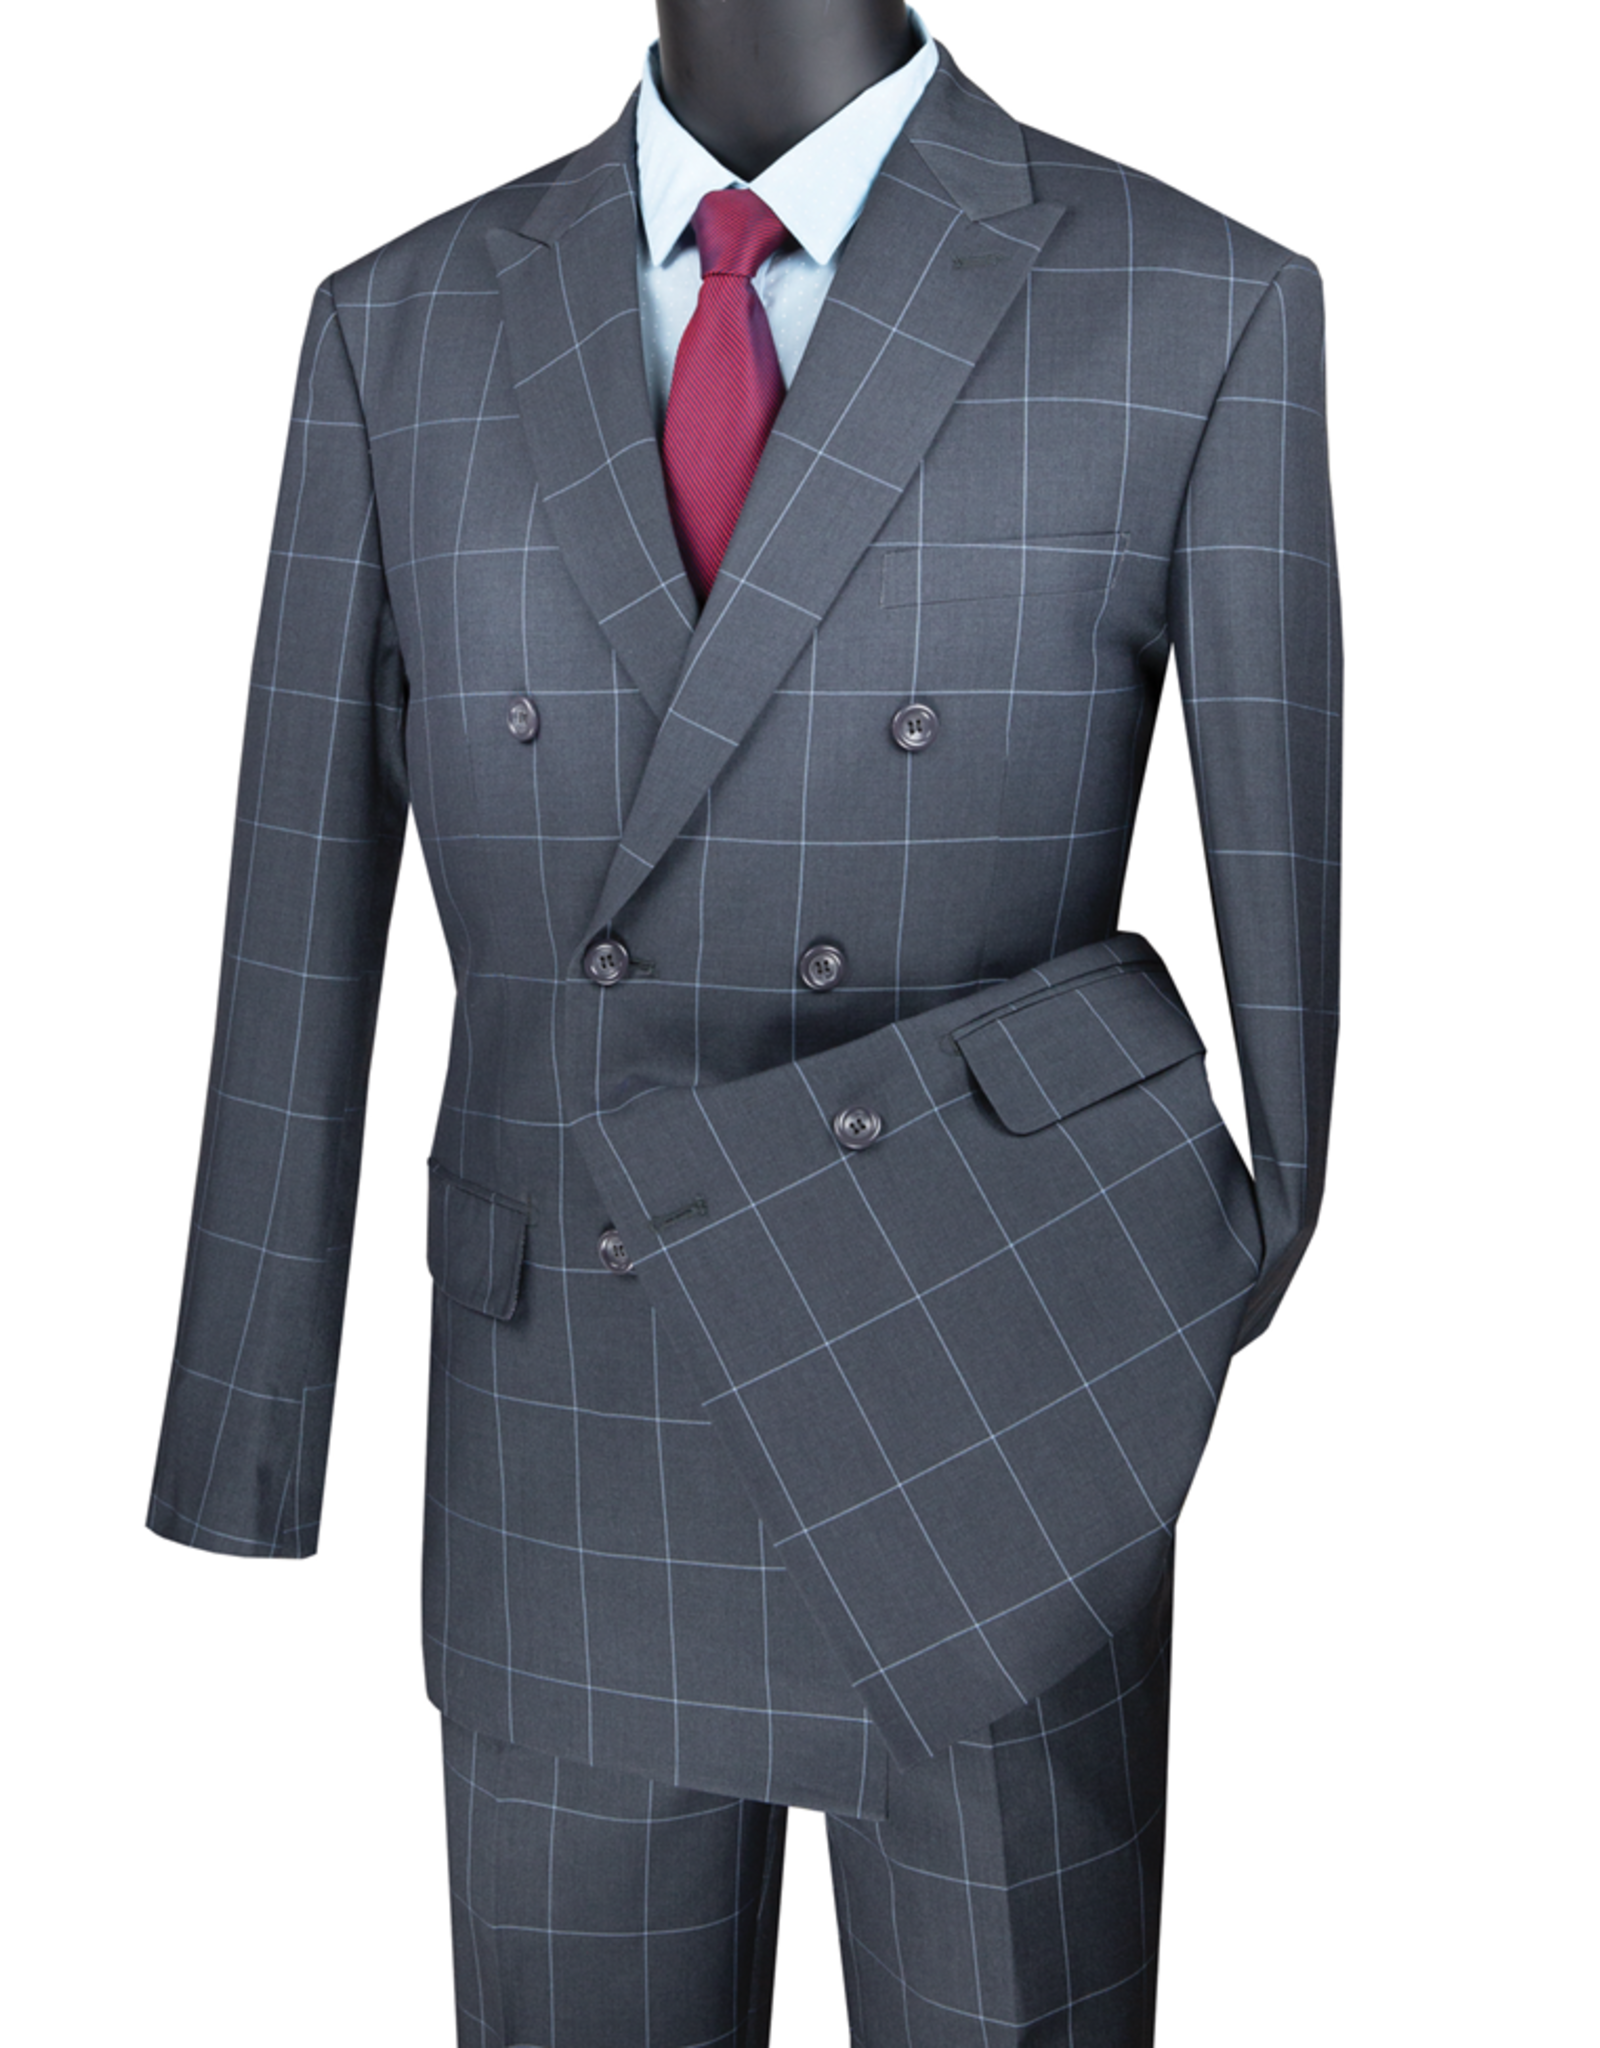 Vinci Vinci Double Breast Suit - MDW1 Gray